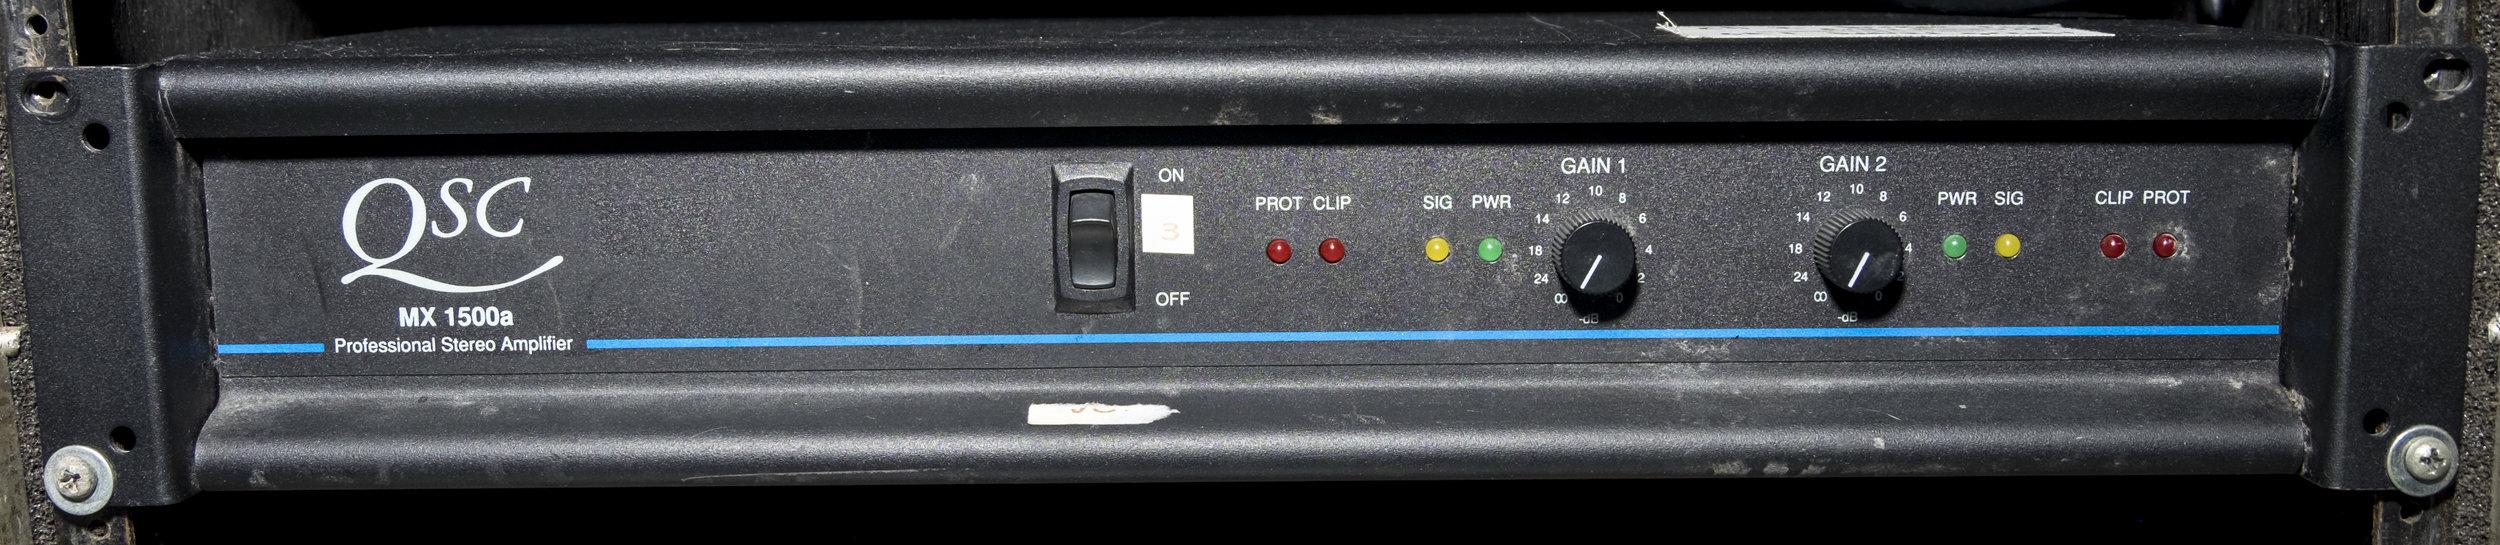 QSC MX1500a.jpg